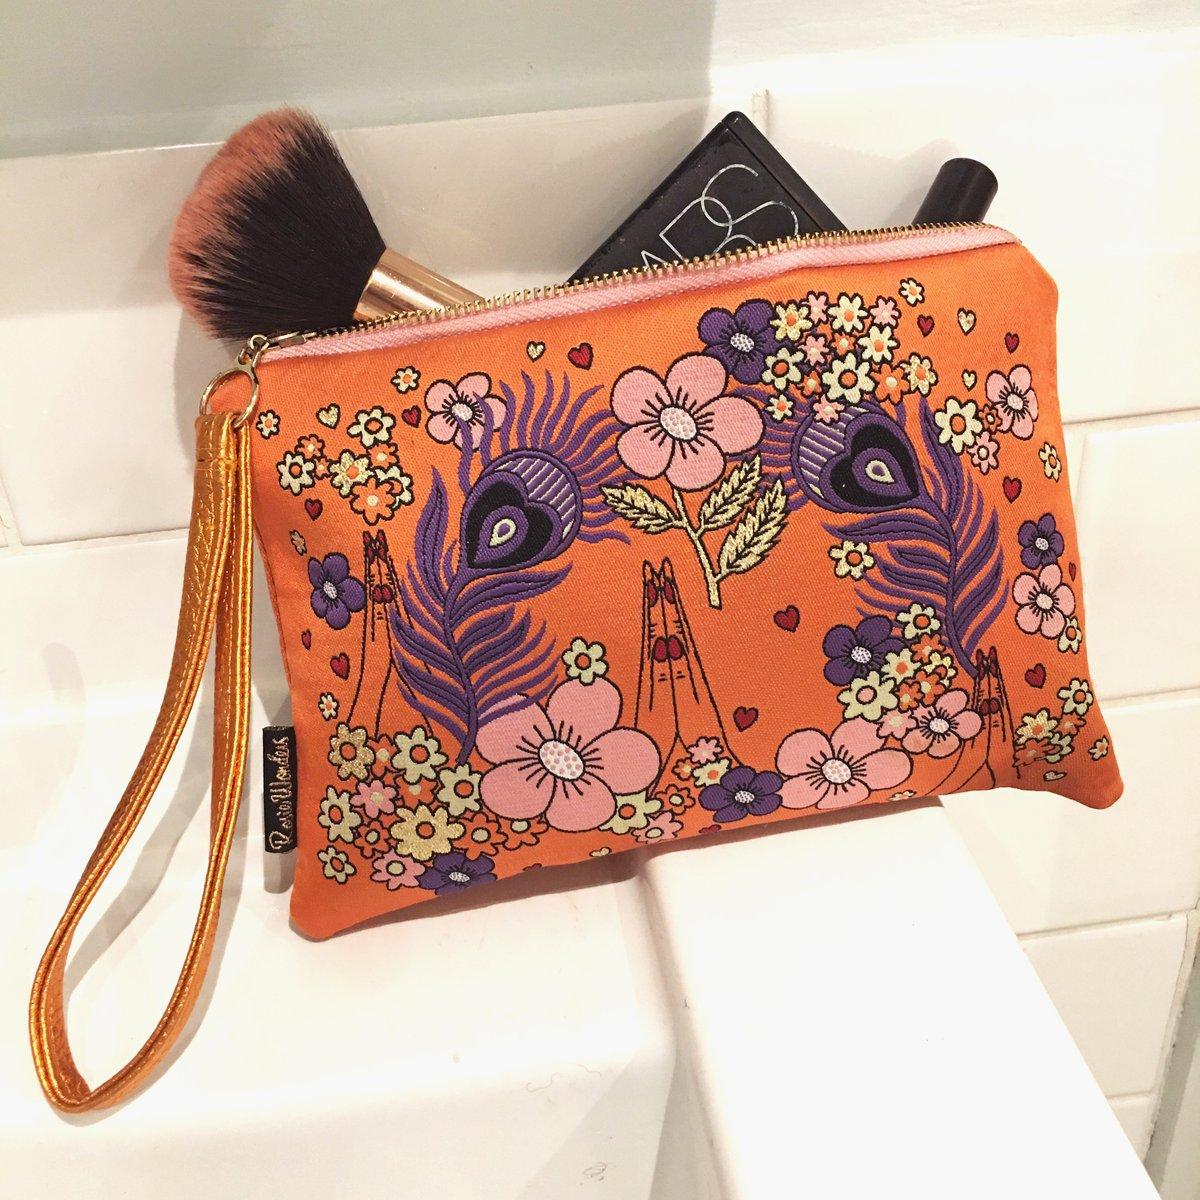 Namaste Woven Wristlet Clutch Bag